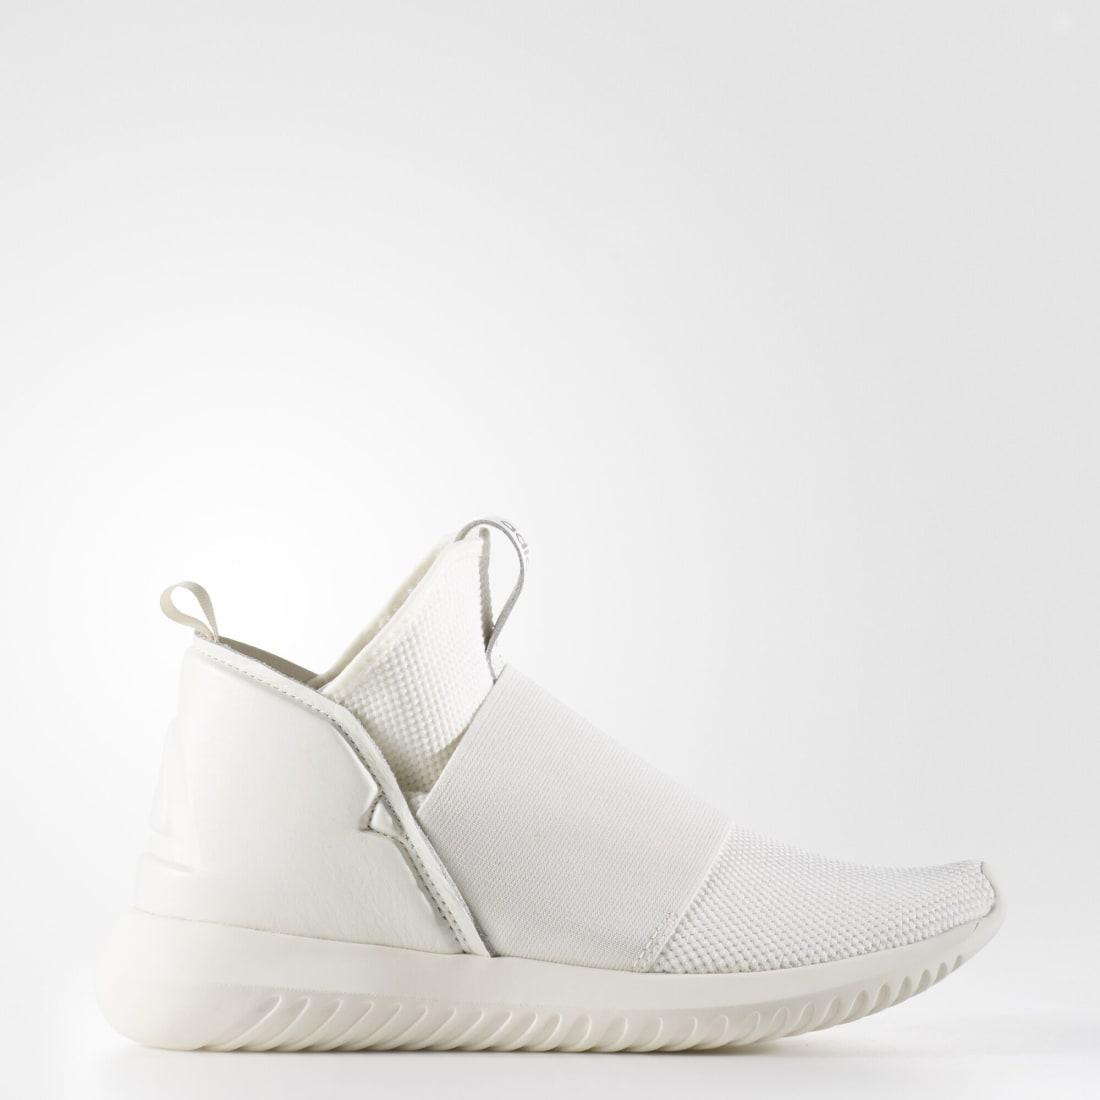 adidas Tubular Defiant RO TF Leather Triple White